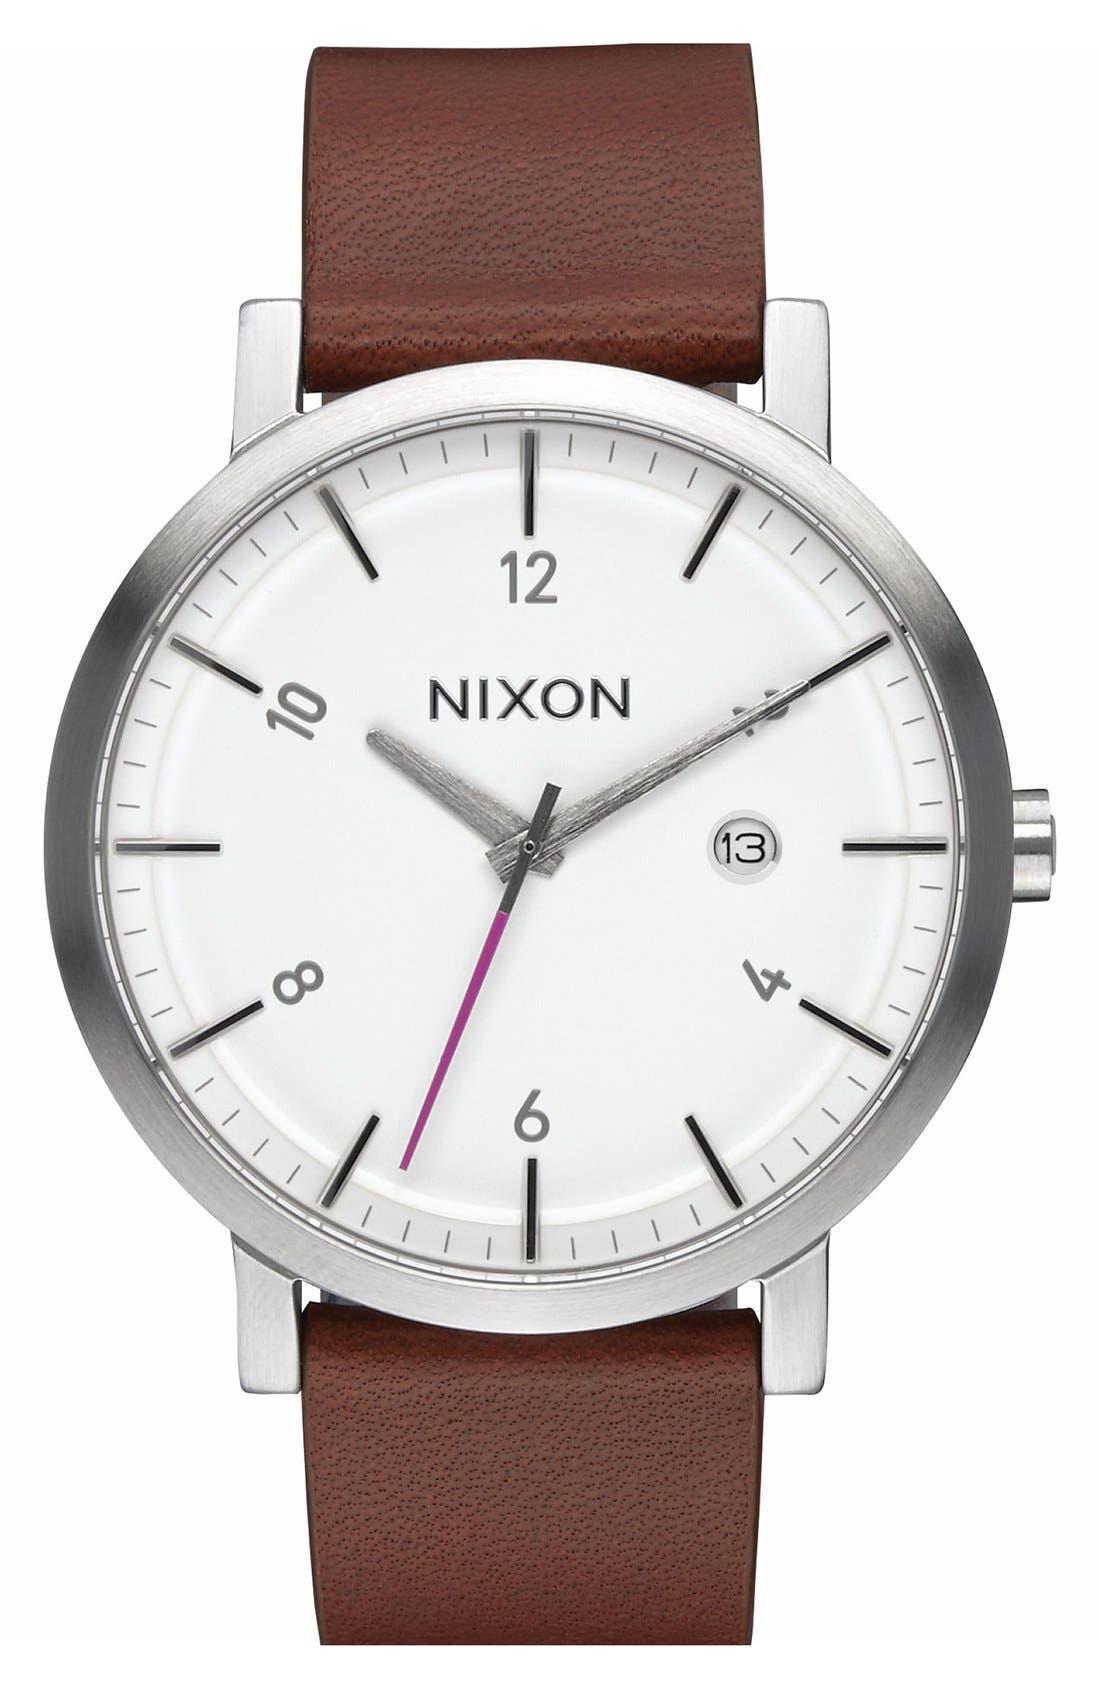 NIXON 'Rollo' Leather Strap Watch, 42Mm in Chestnut/ White